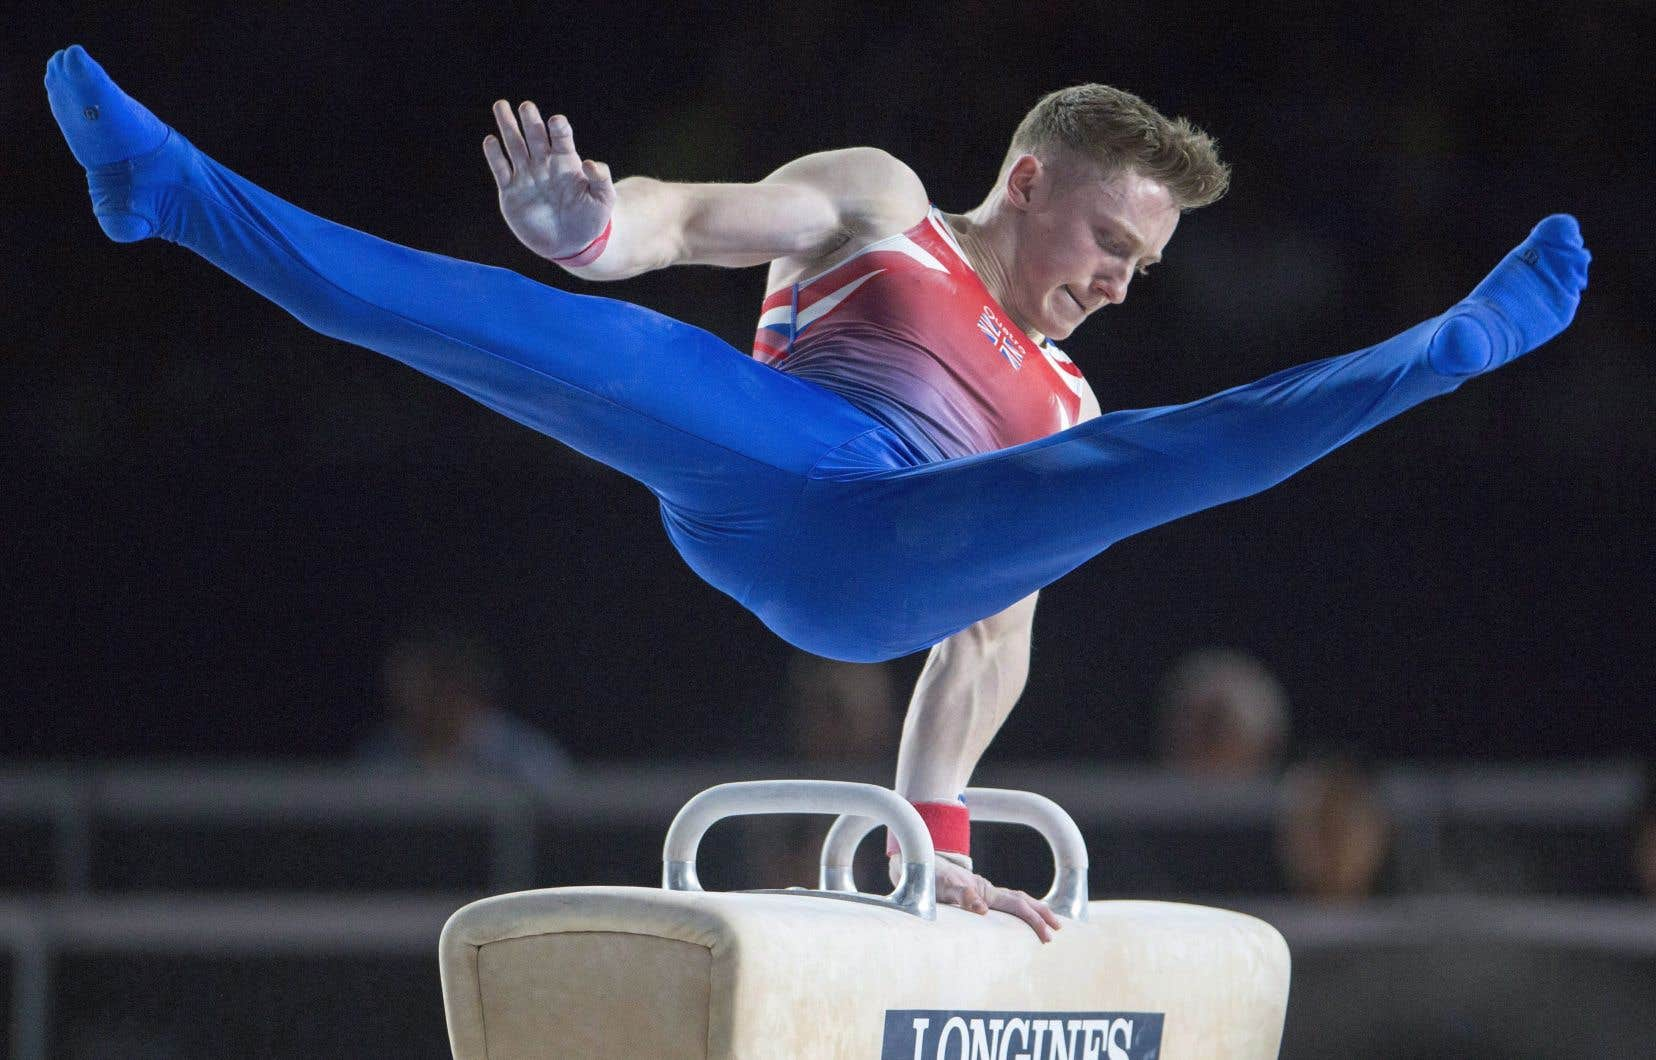 Nile Wilson, un gymnaste britannique, médaillé de bronze aux JO de Rio en 2016